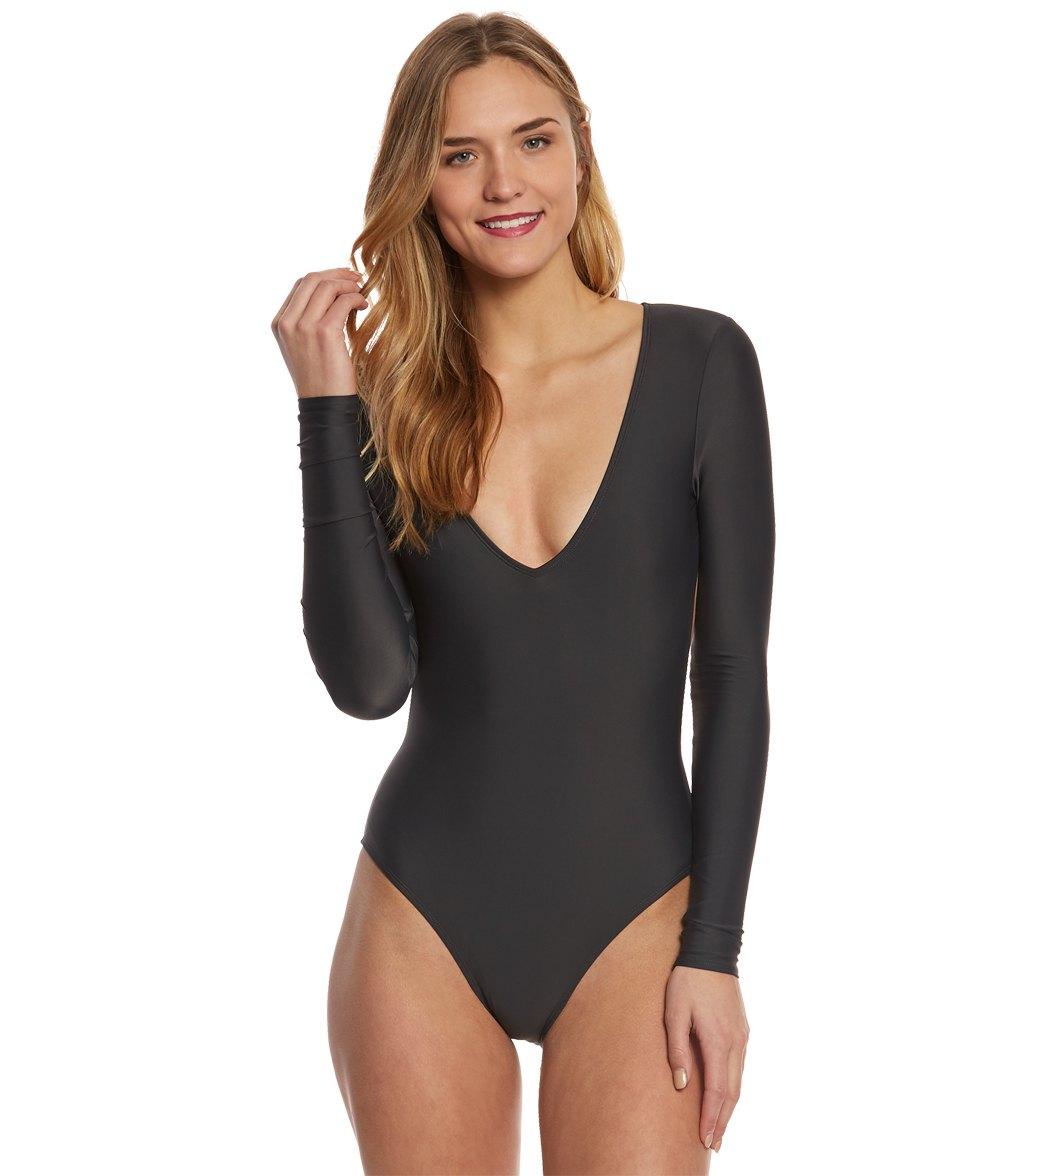 Billabong Surf More Bodysuit at SwimOutlet.com - Free Shipping 5974e9832